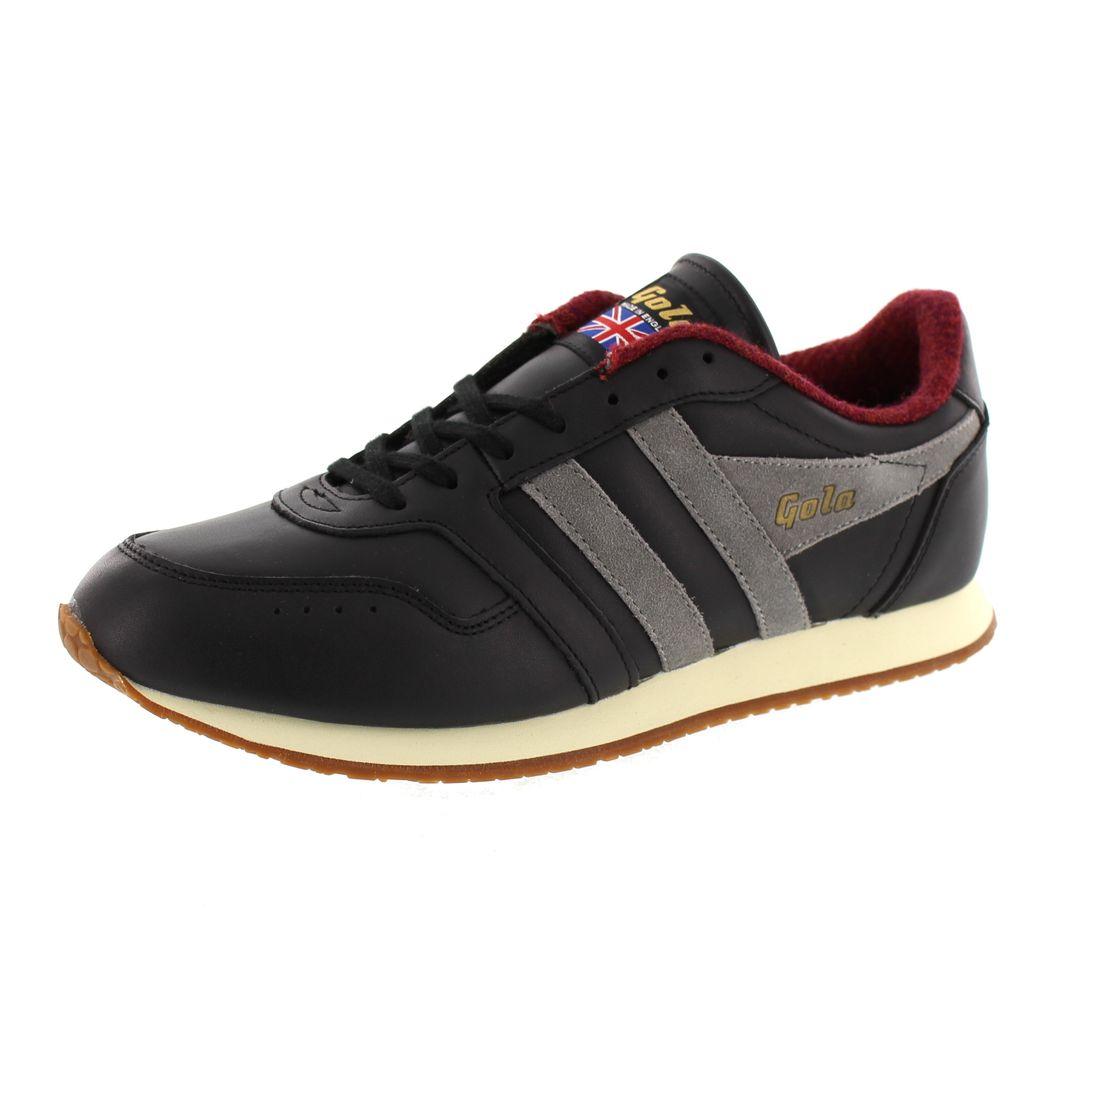 GOLA Herren - Sneaker TRACK 1905 CMA906 - black grey